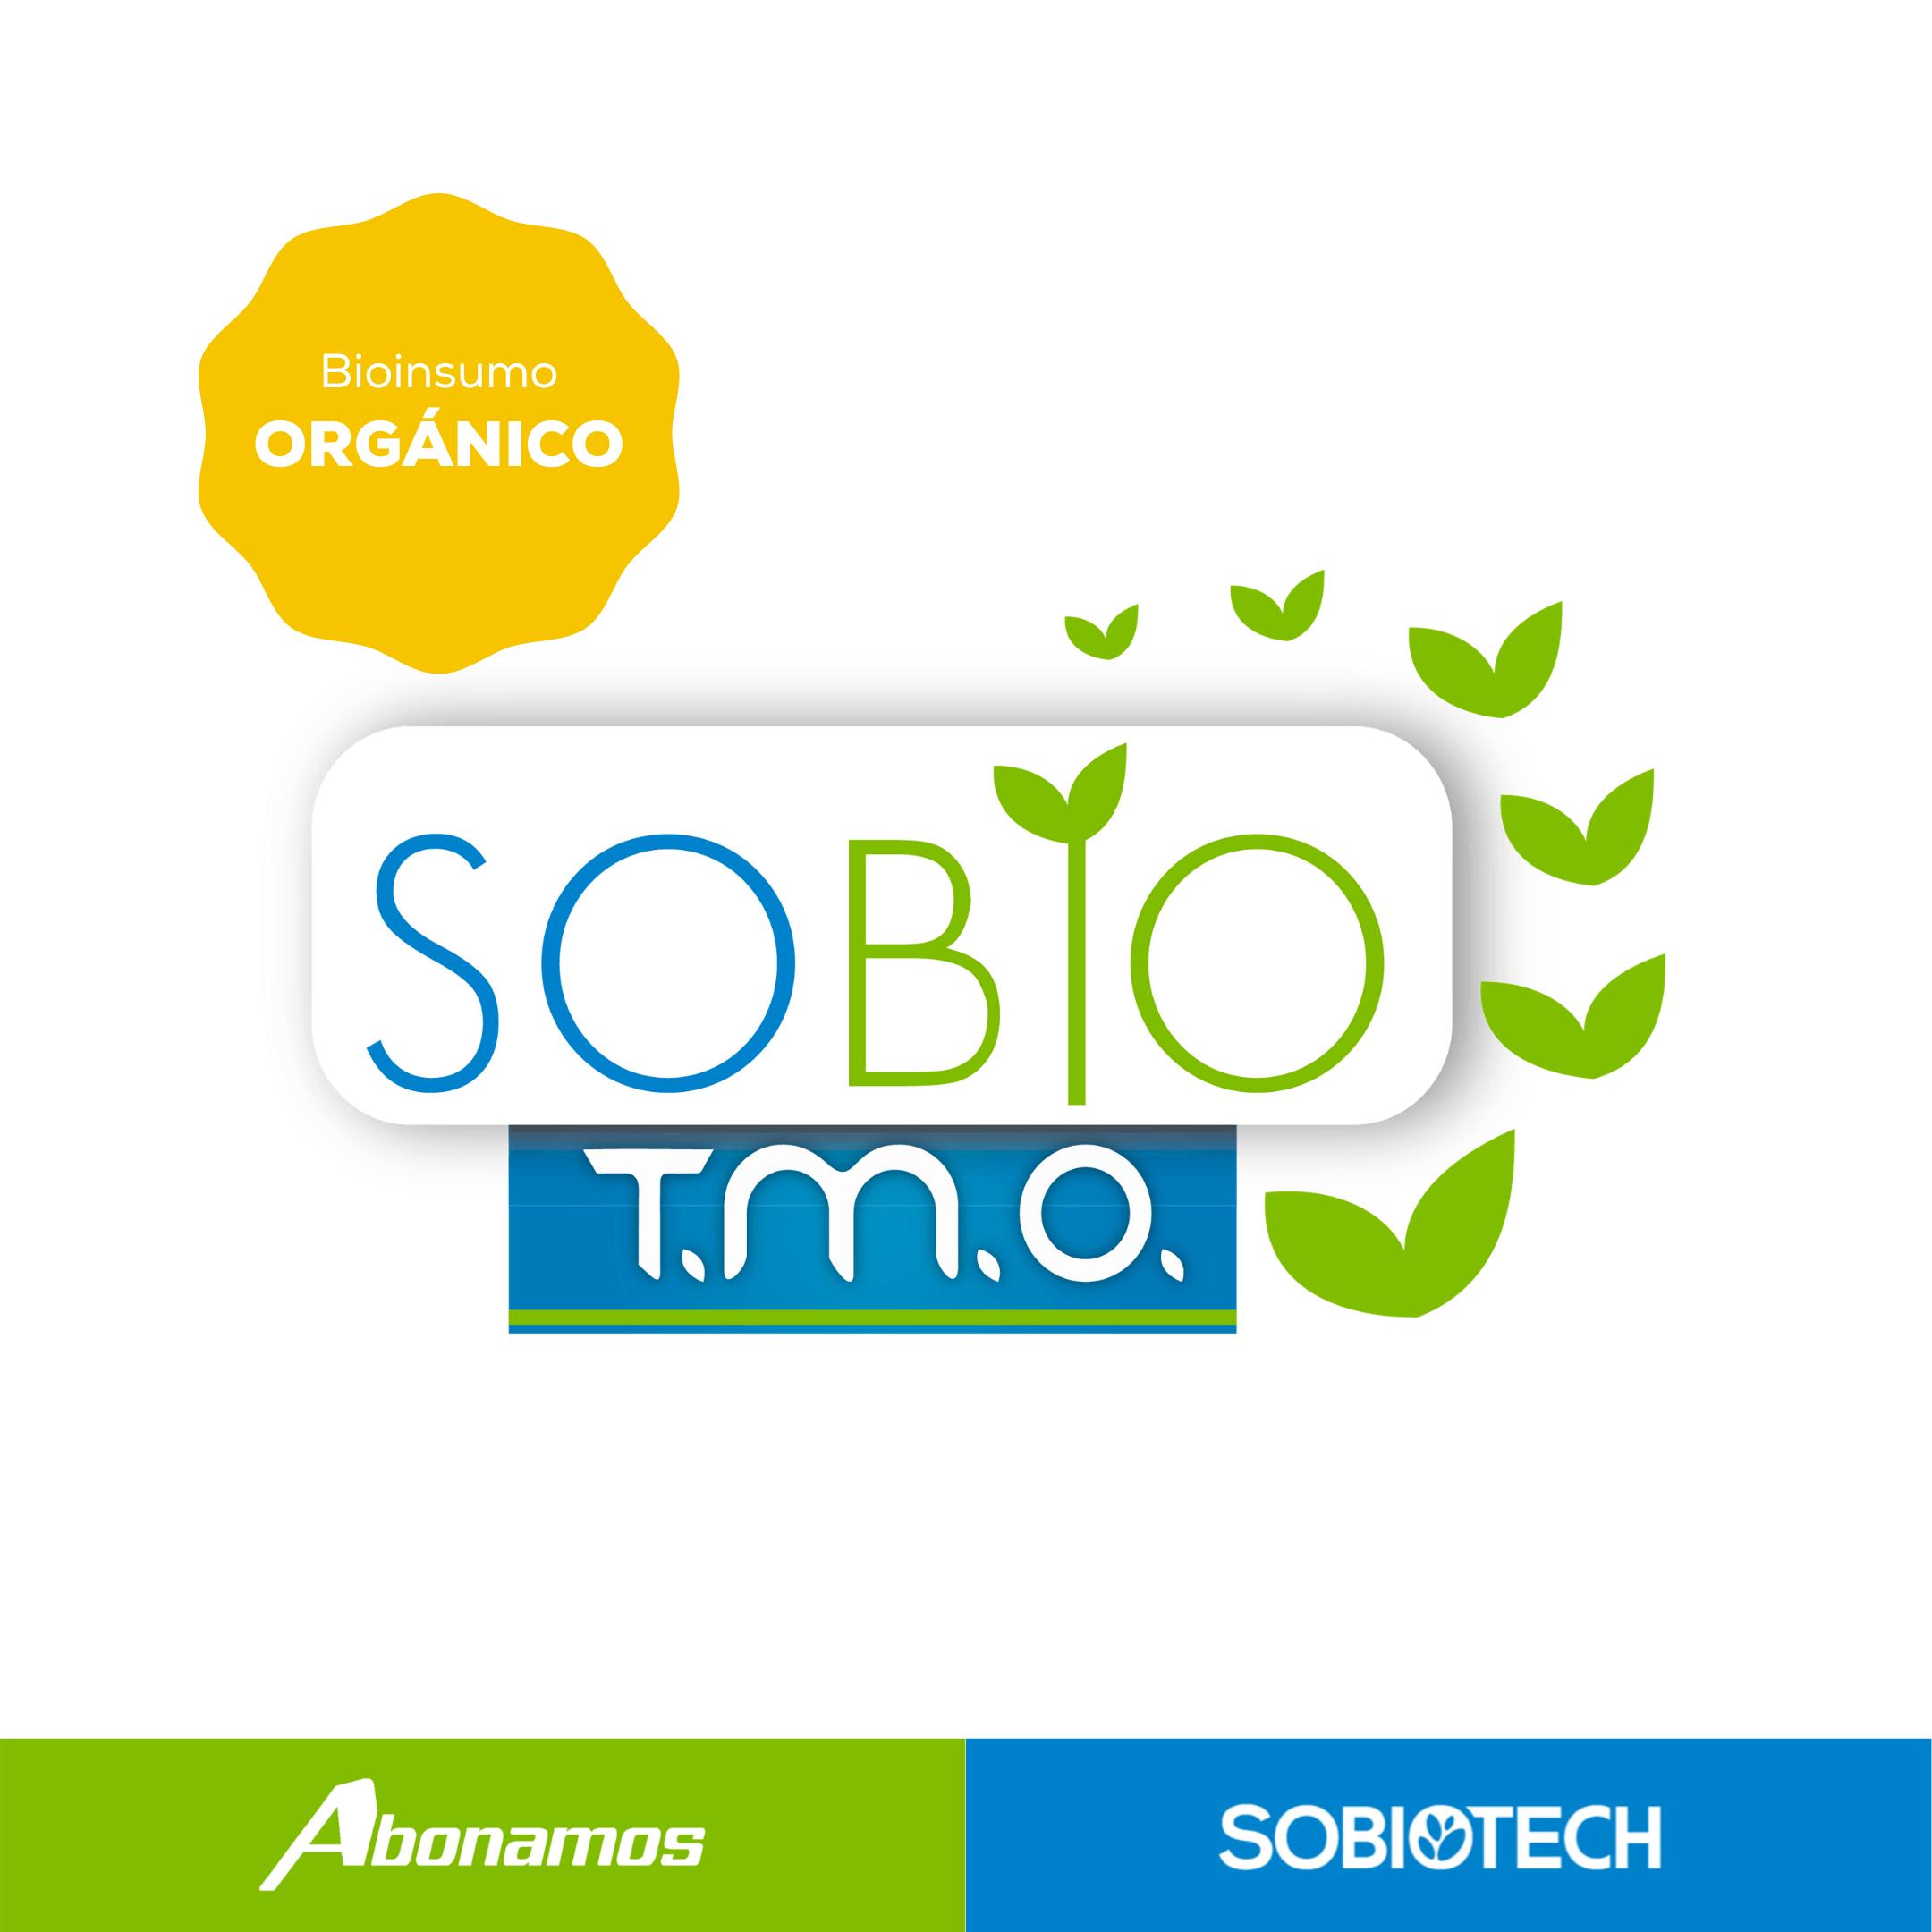 6-Bioinsumo-orgánico-Abonamos-Micorrizas-de-Sobiotech.png